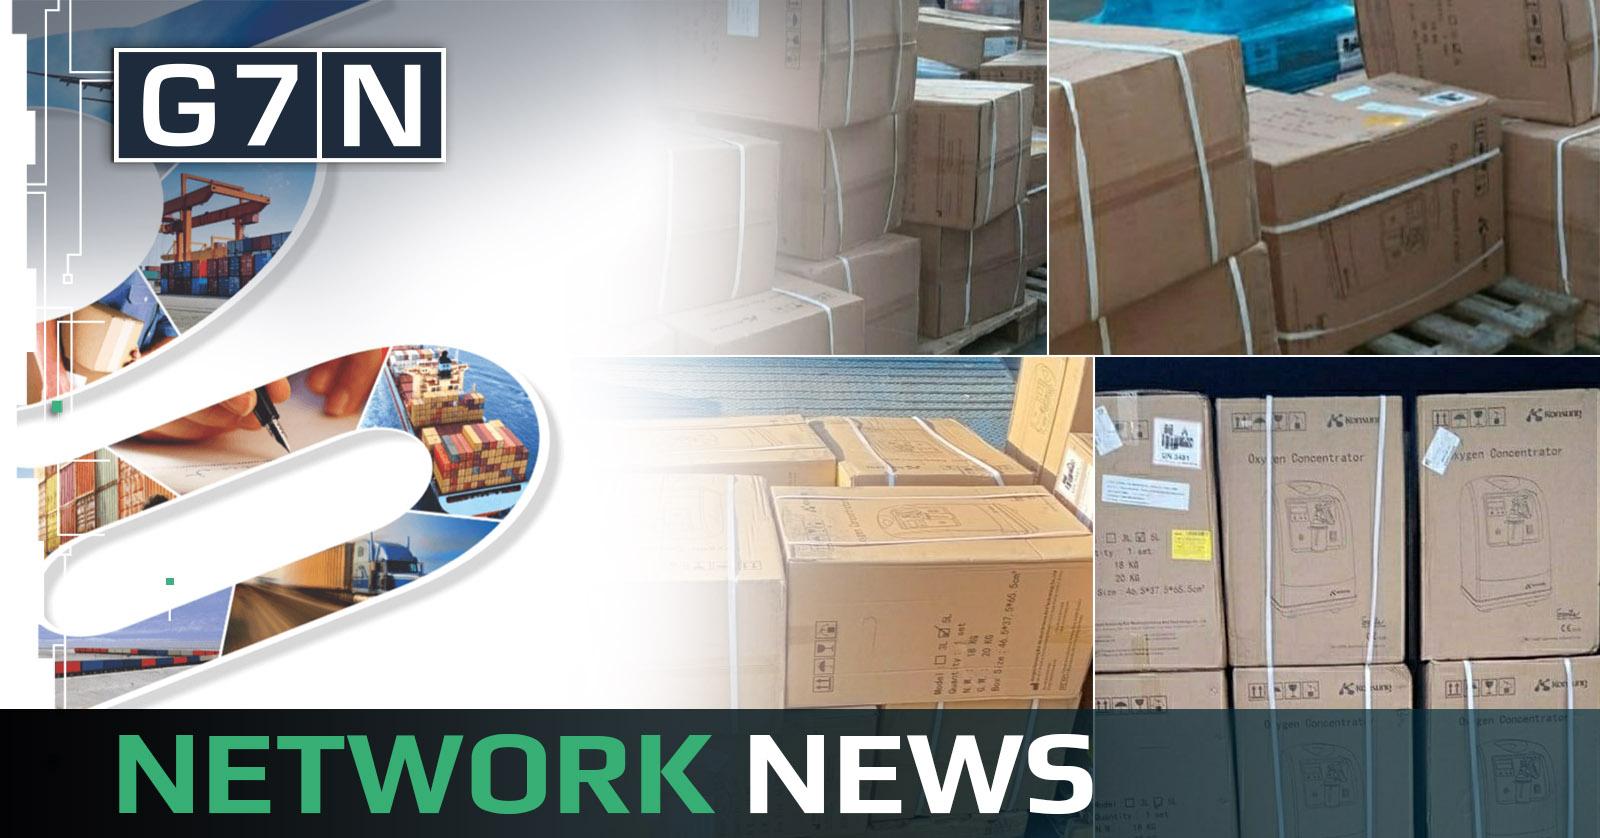 https://newg7dashboard.g7networks.com/news/news__260521_G7N_galx_NEWS.jpg